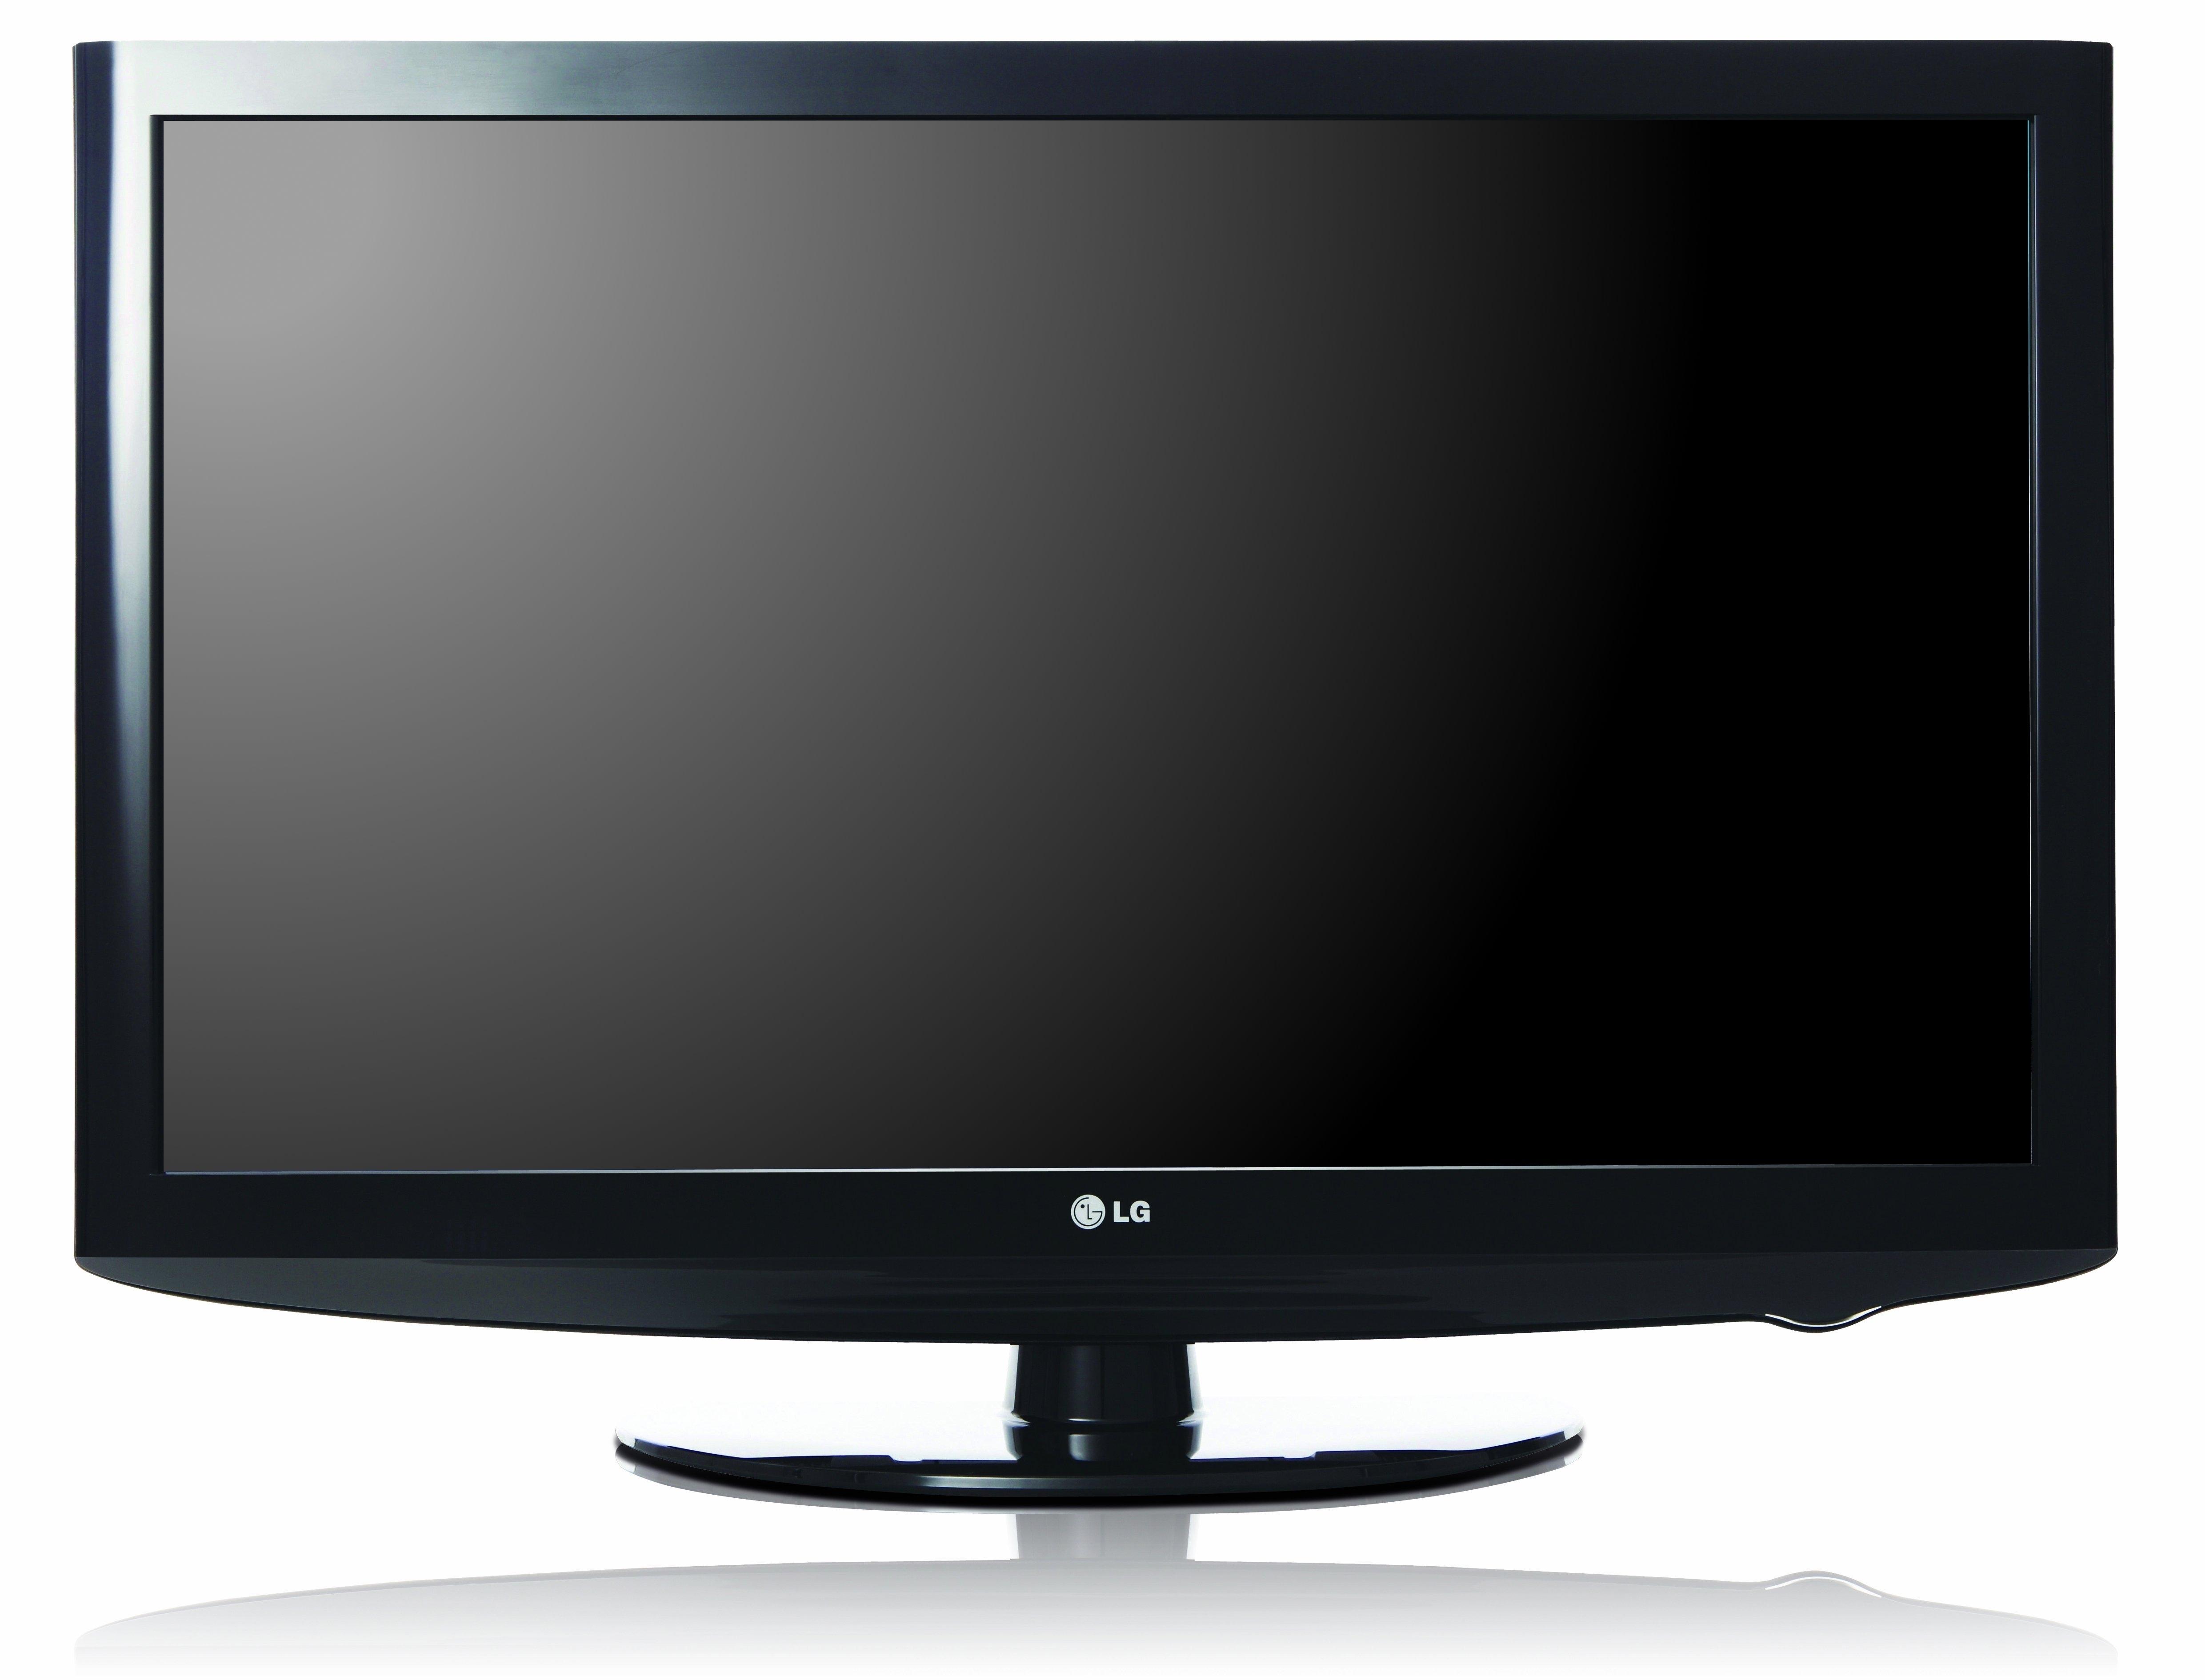 LG 32LH250C LCD TV